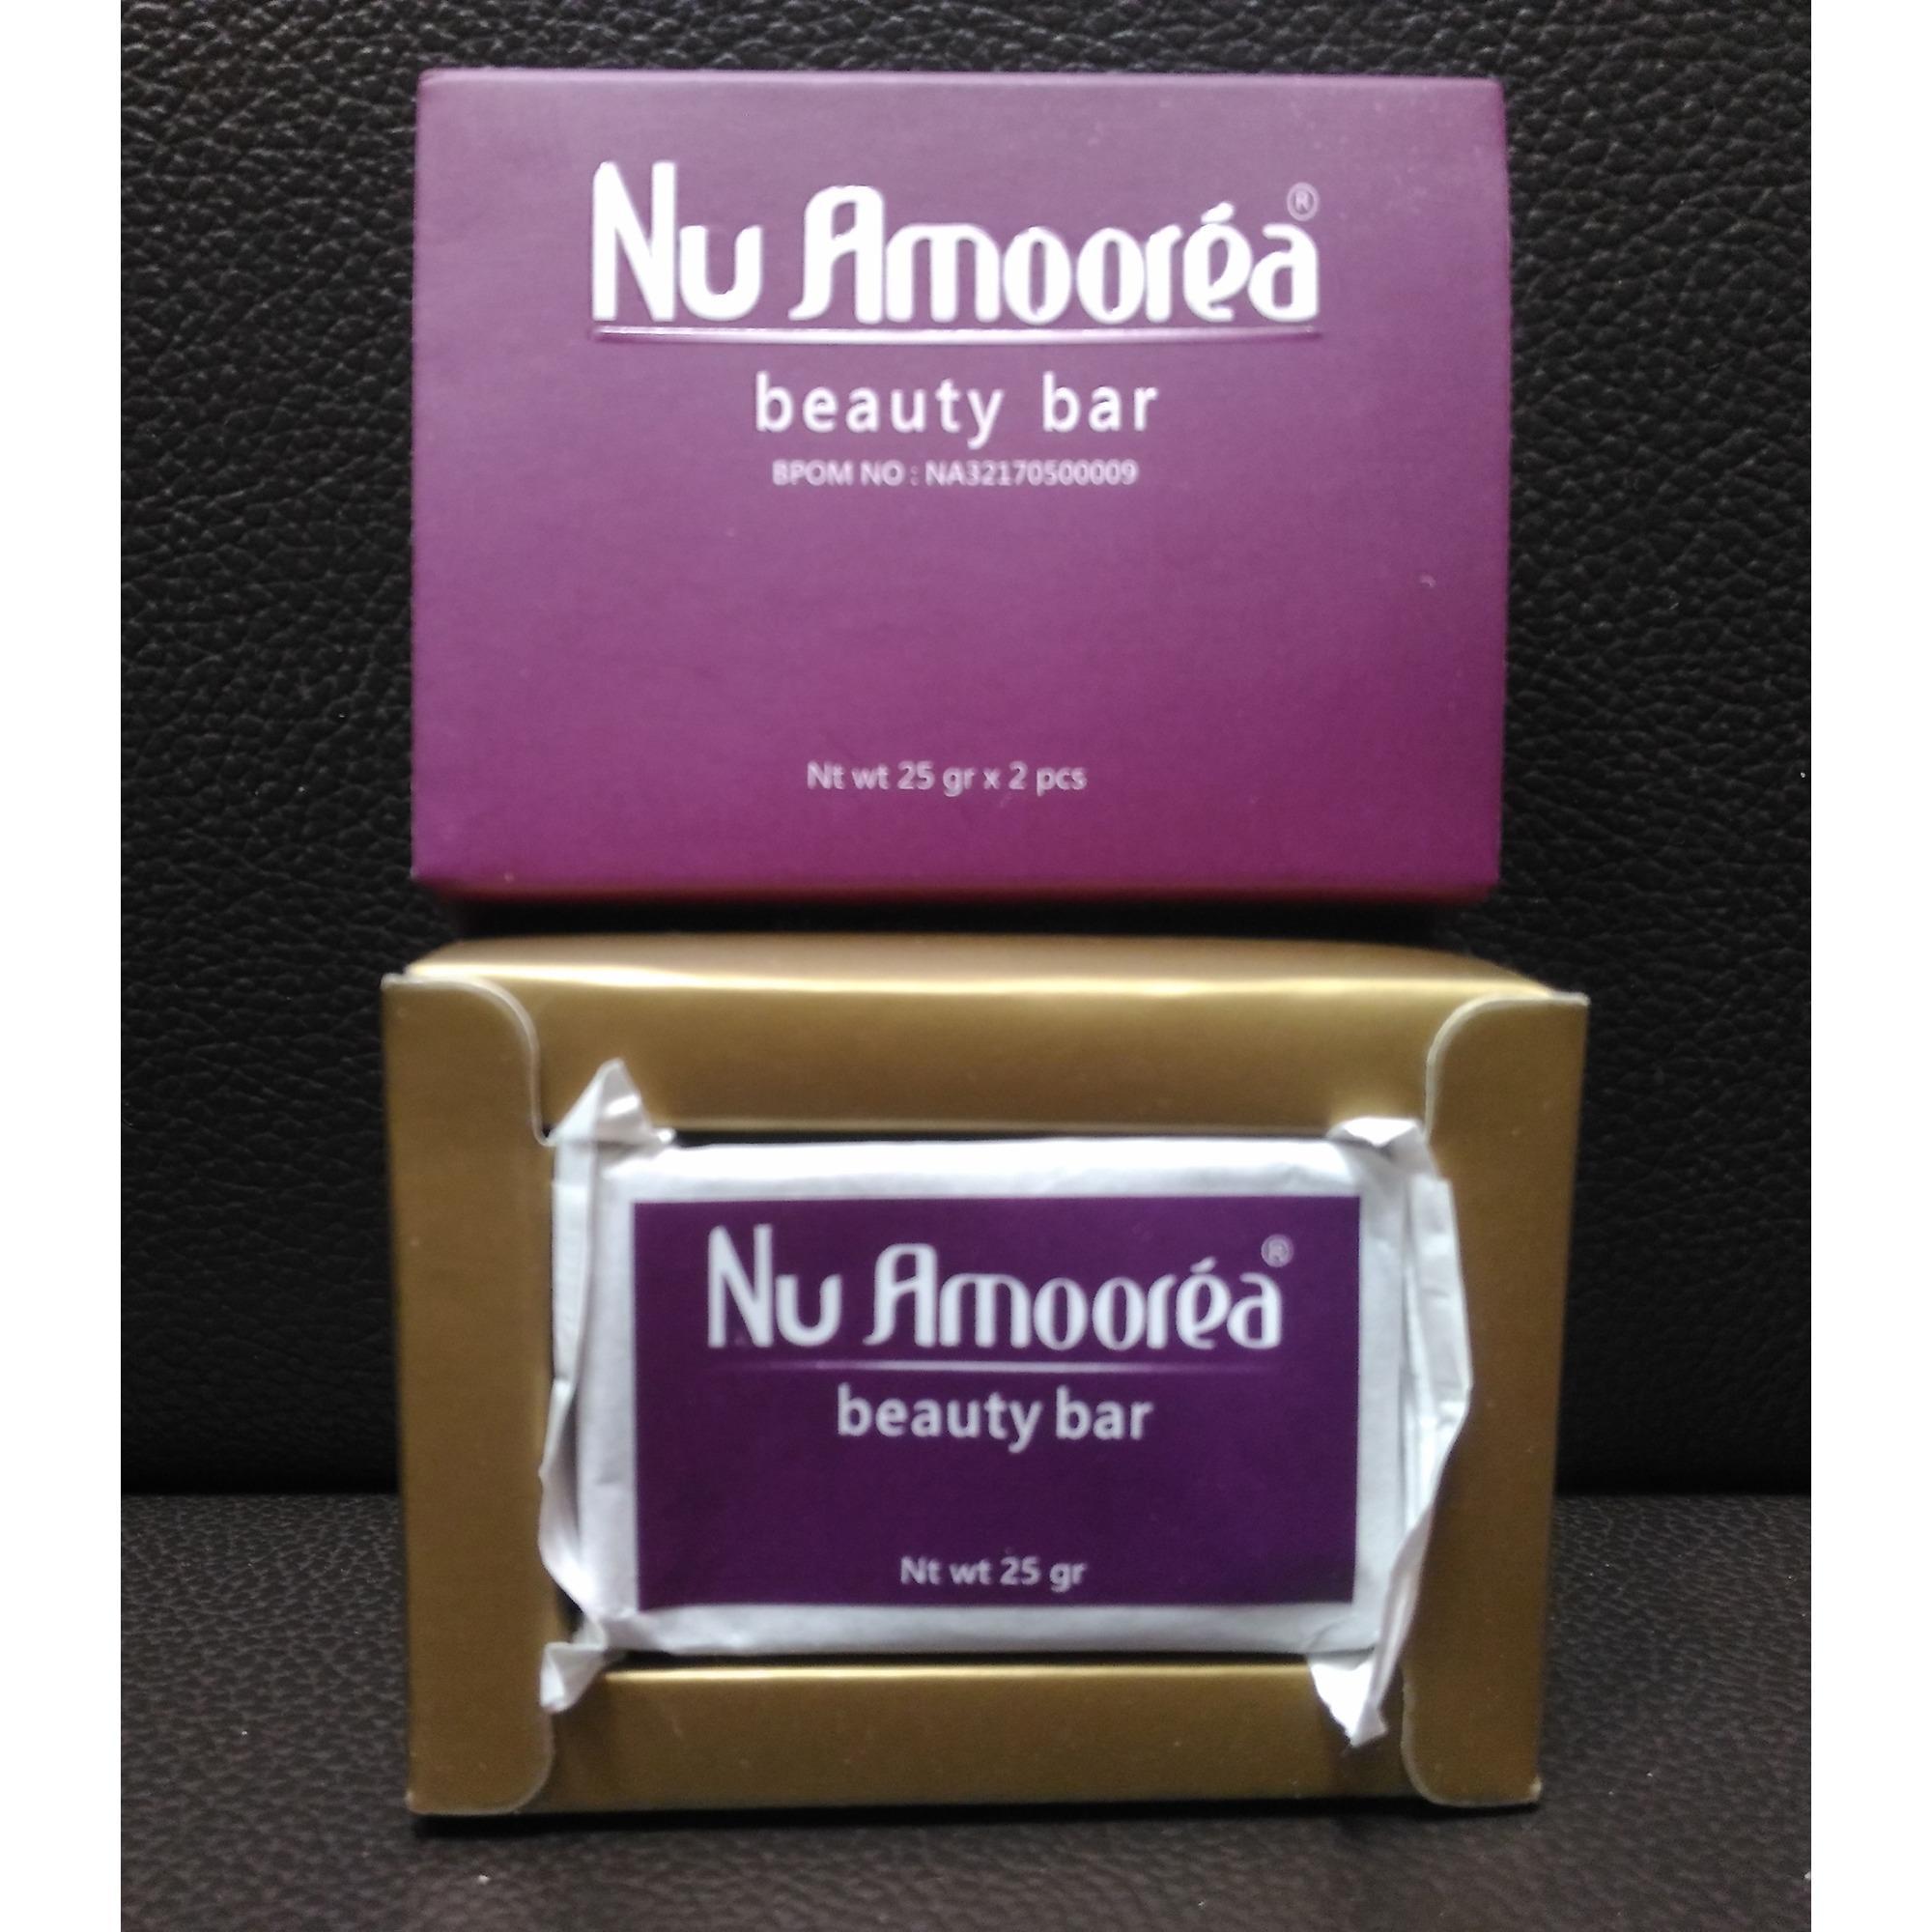 Nu Amoorea Amoera Sabun Beauty Bar 25gr